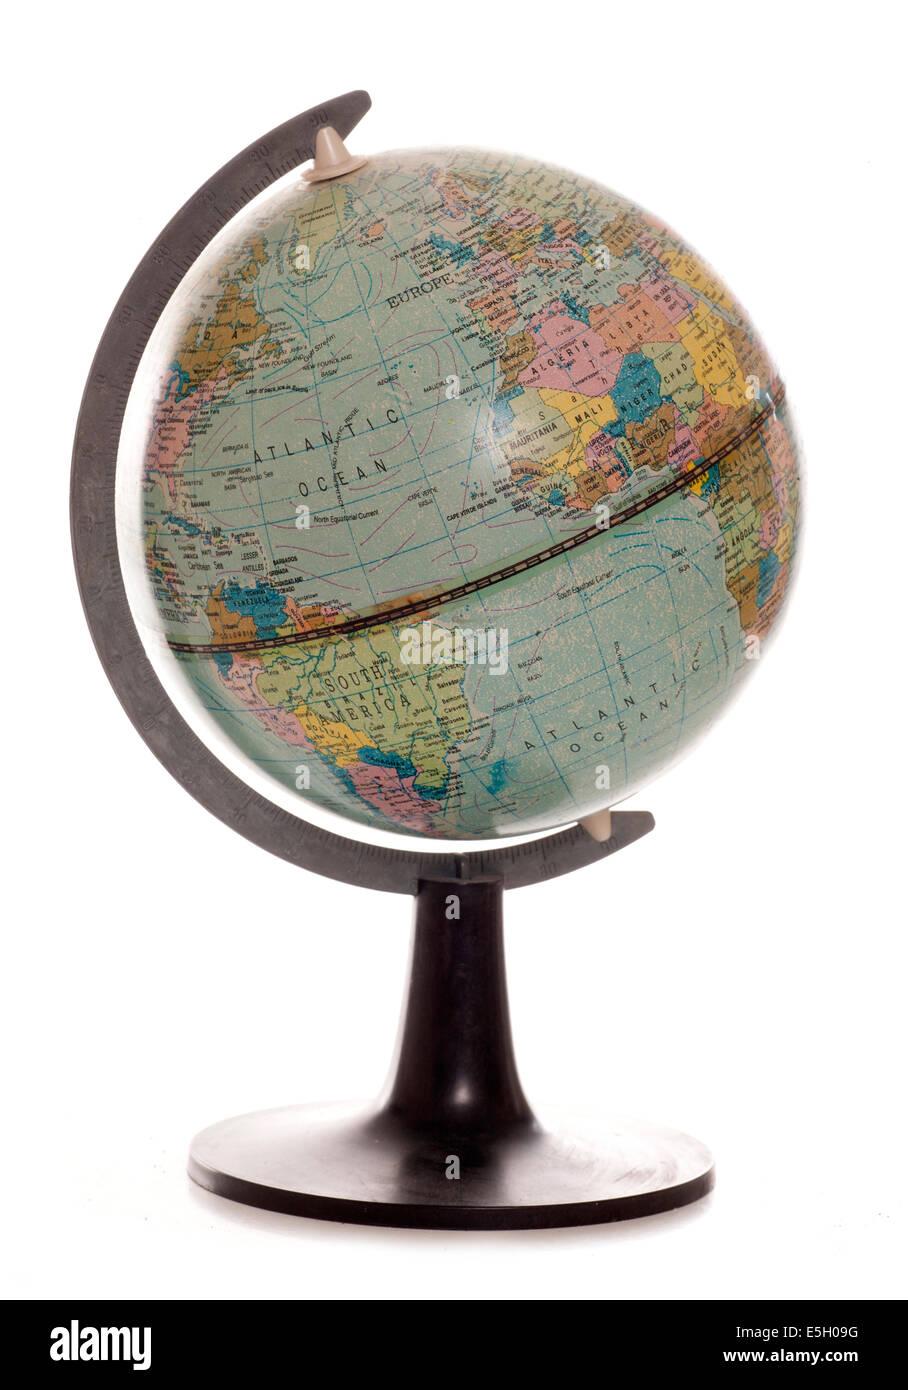 Vintage desk globe studio cutout stock photo 72288204 alamy vintage desk globe studio cutout gumiabroncs Image collections